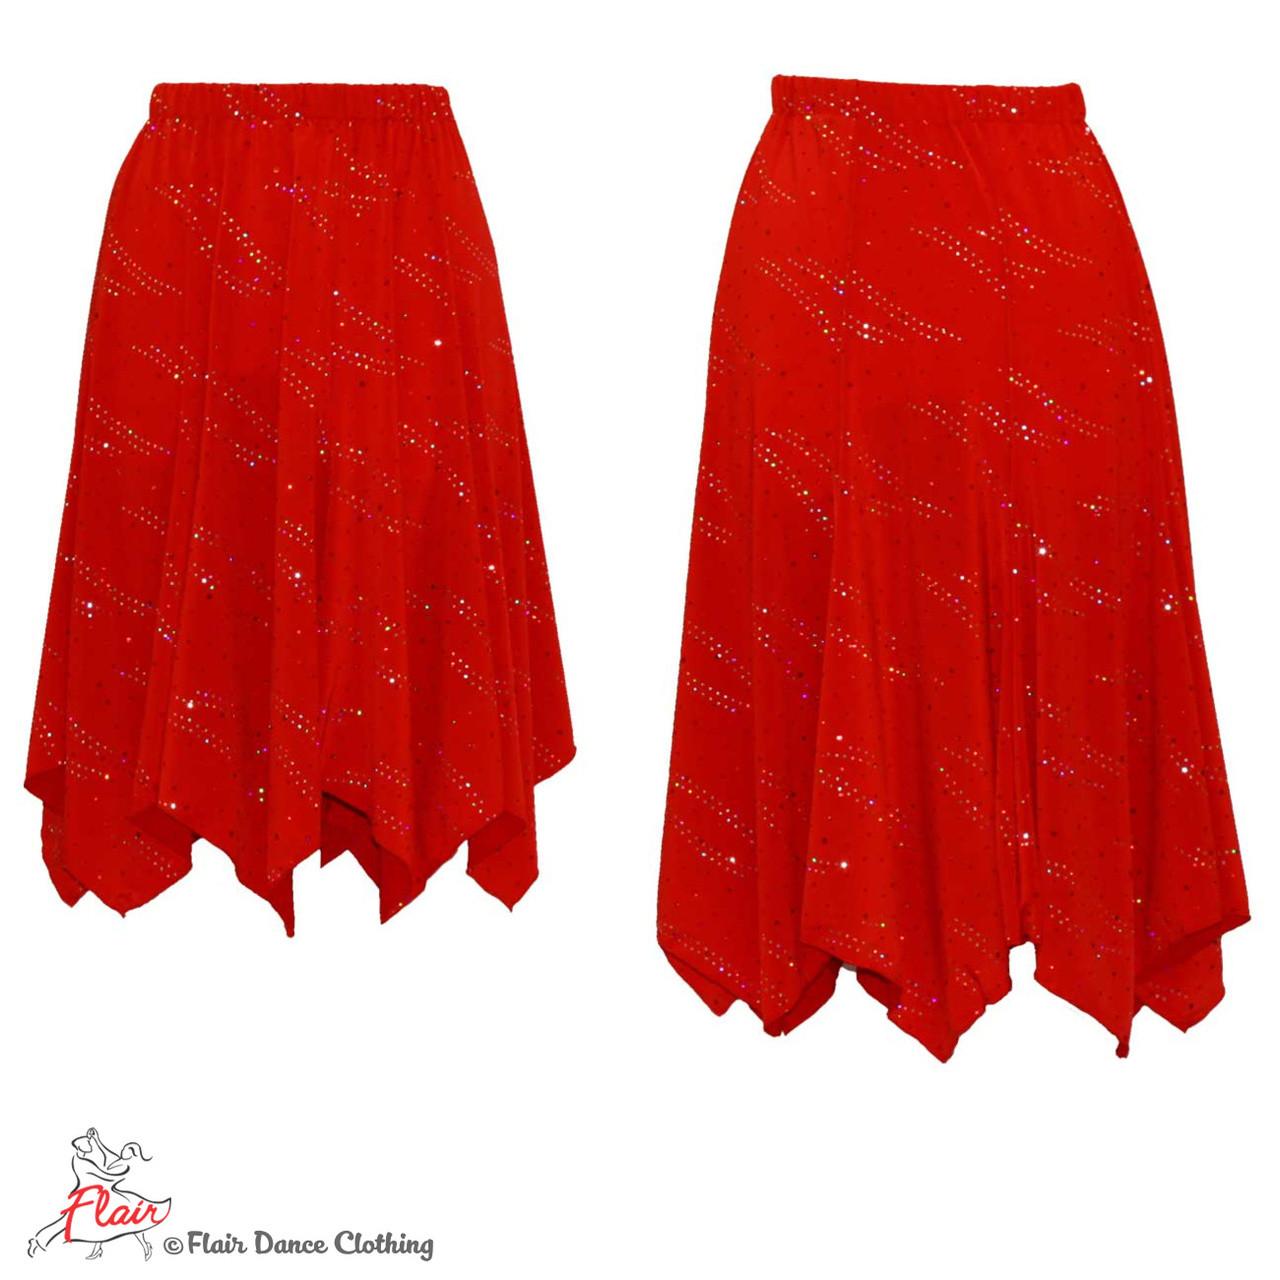 6b9e23c2cc Red with Sequins Hanky Hem Skirt - Flair Dance Clothing